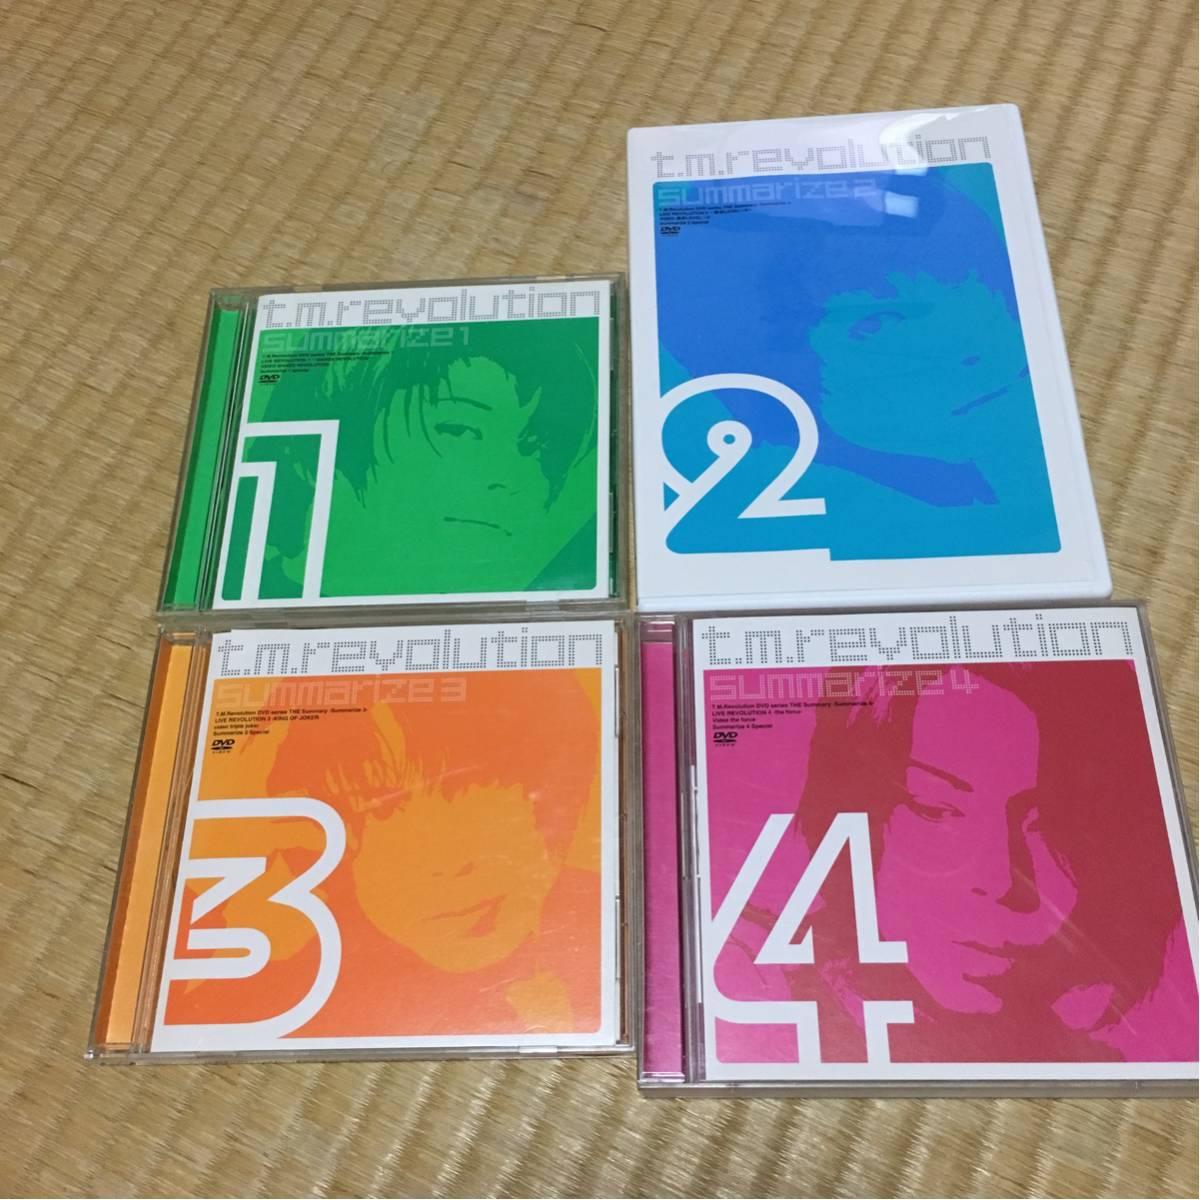 T.M.Revolution Summarize4枚セット 中古品 ライブグッズの画像